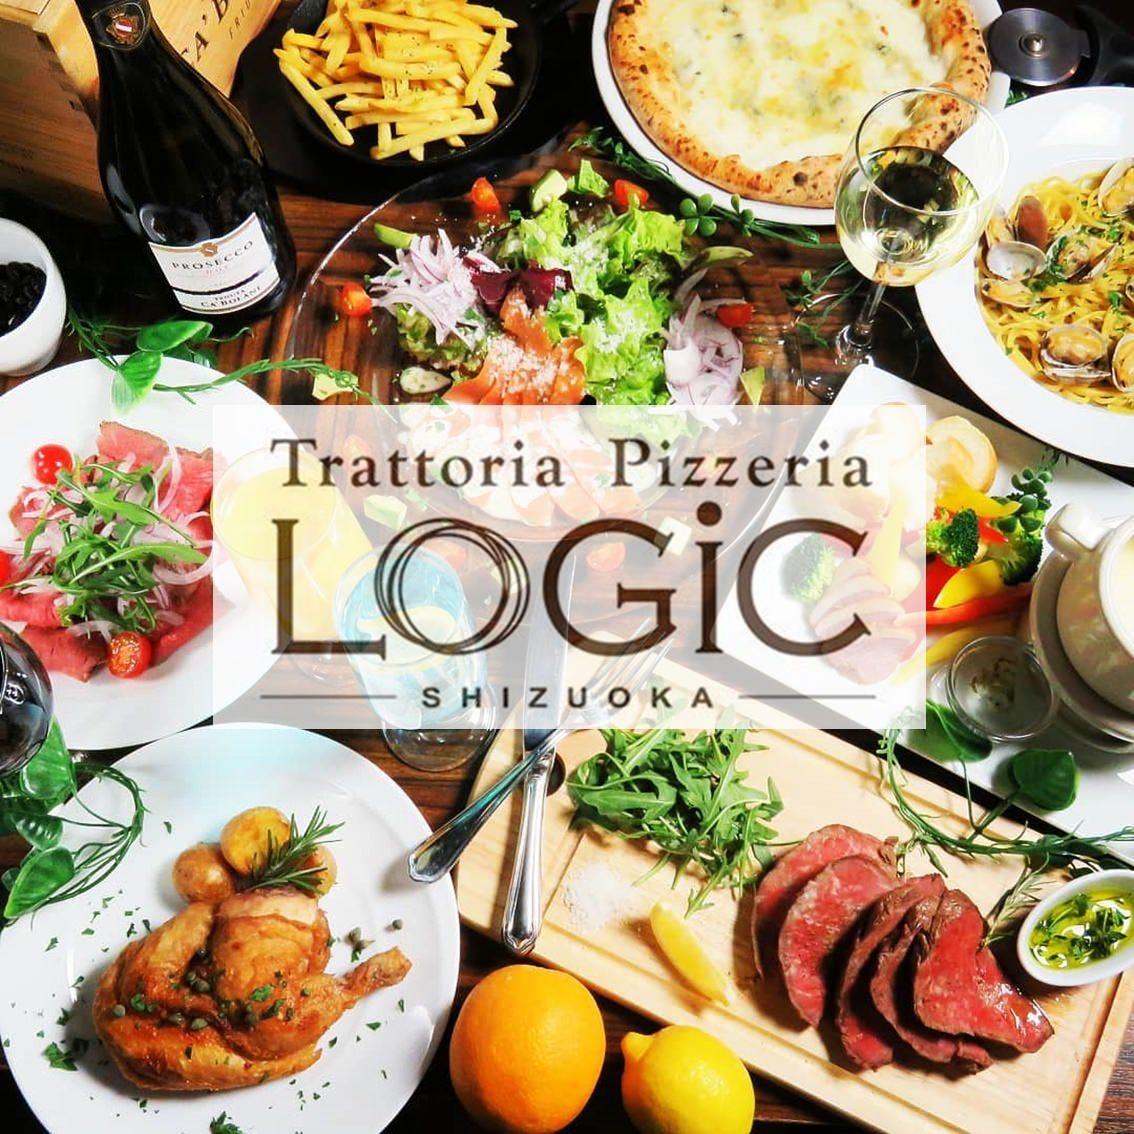 Trattoria Pizzeria LOGIC Shizuoka